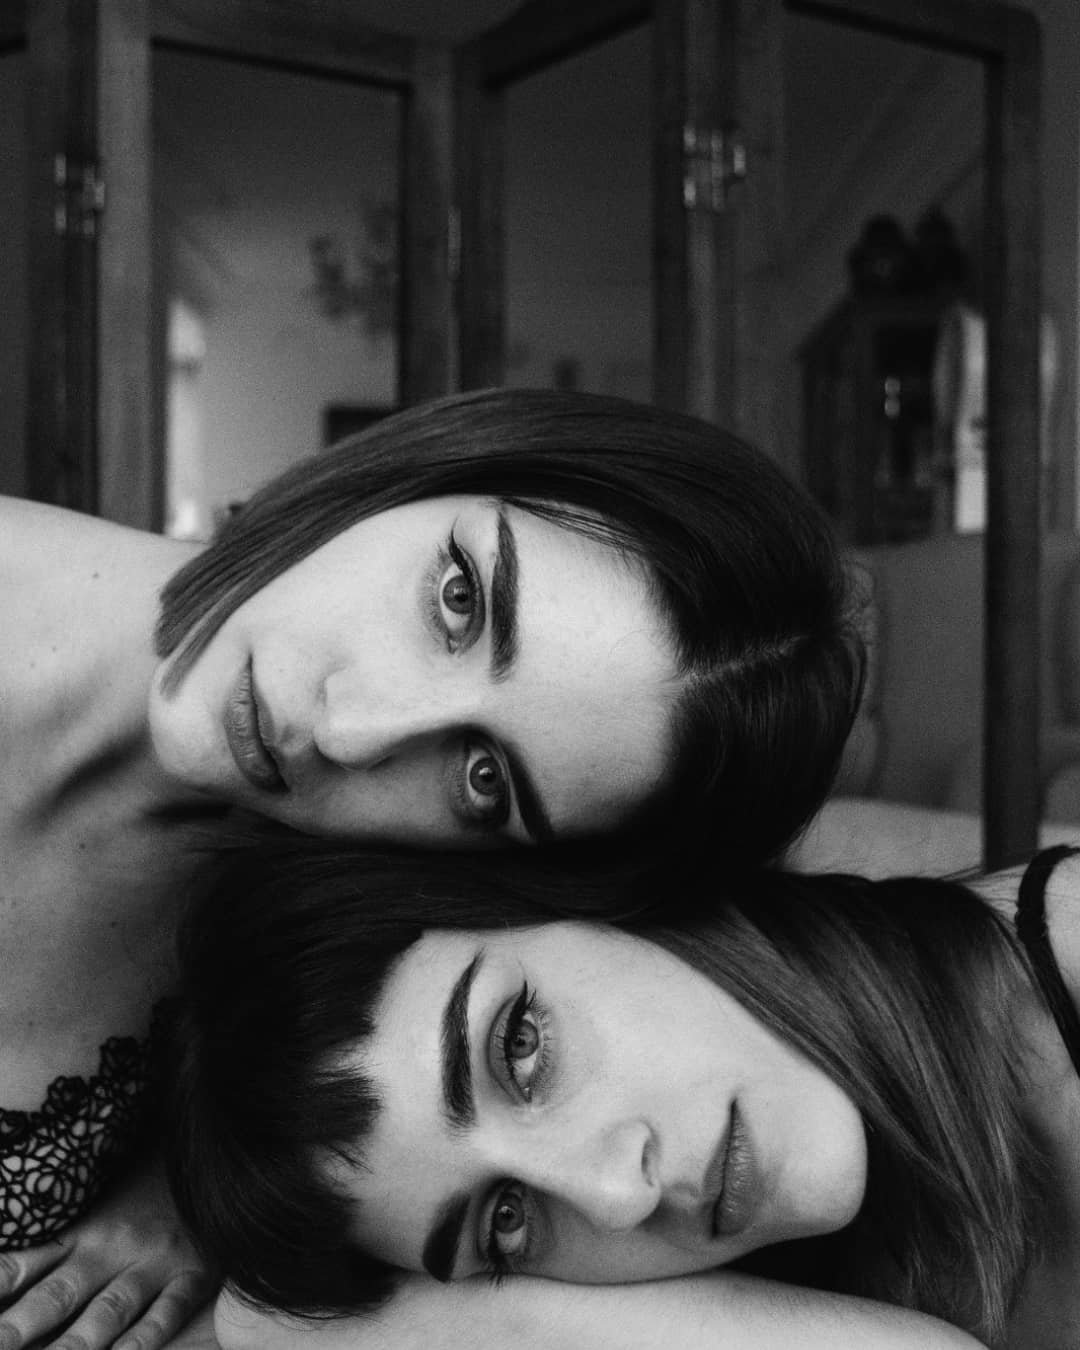 beautiful_black_and_white_portrait_photography_34.jpg